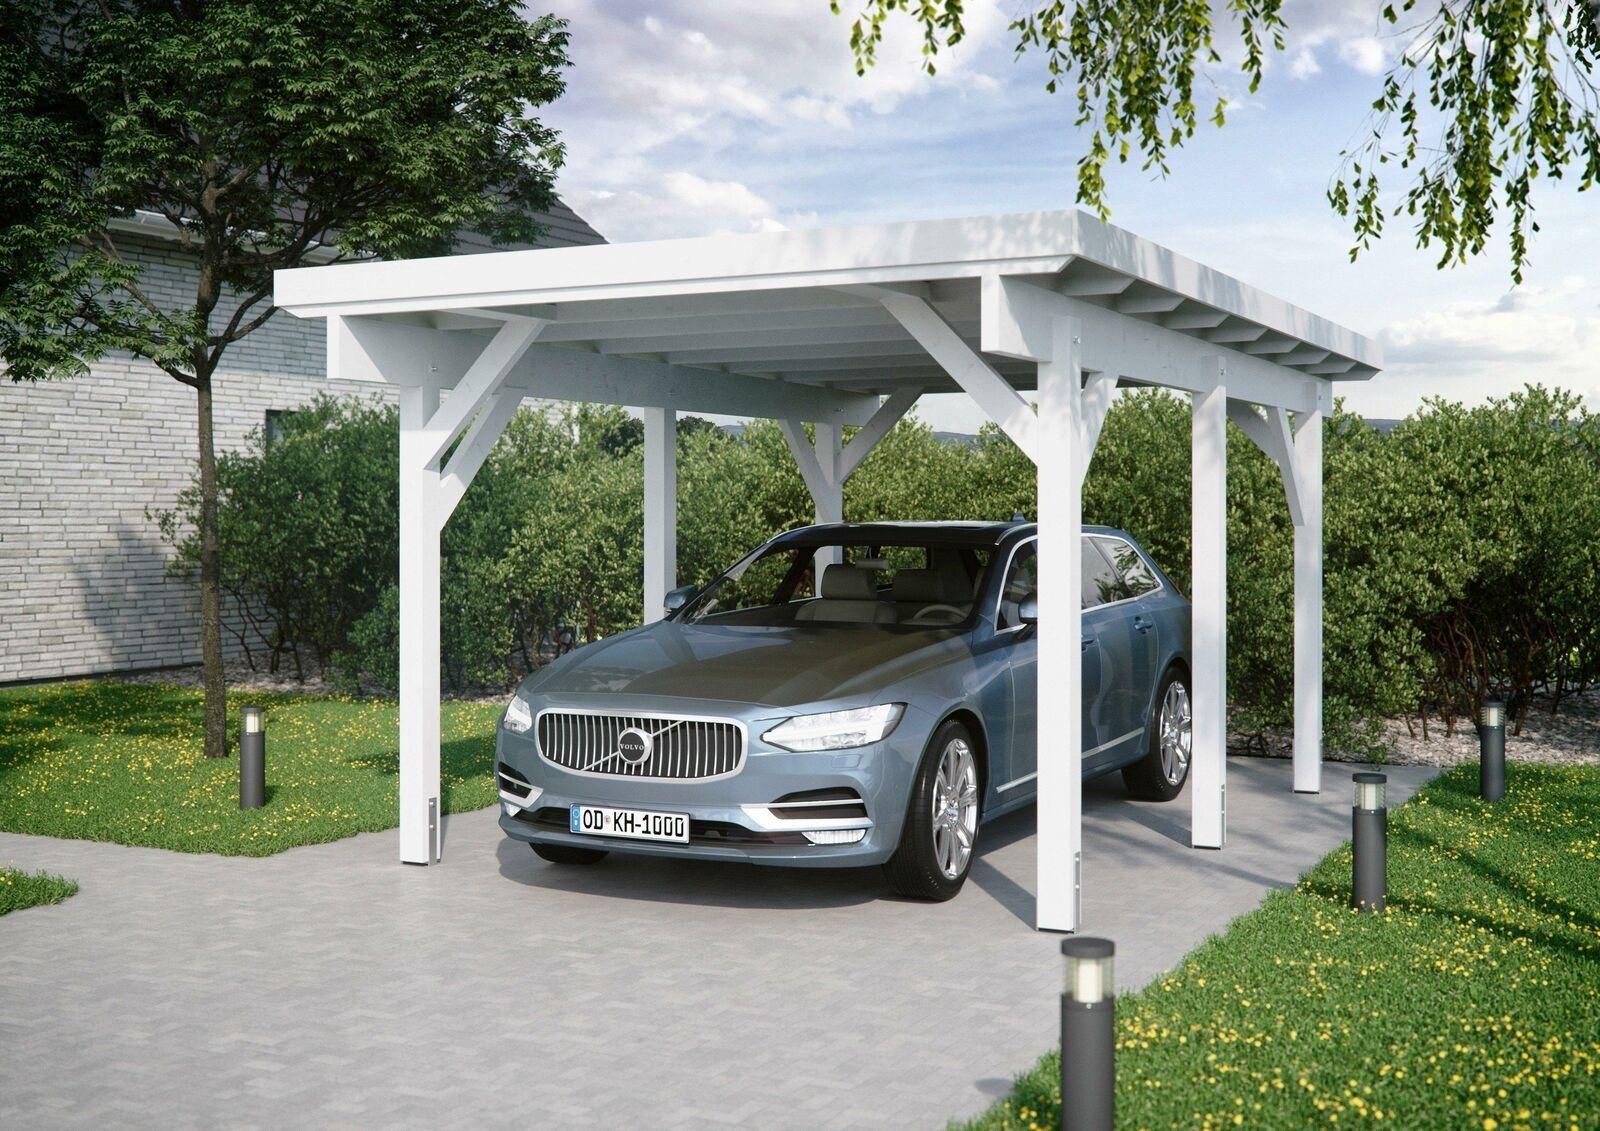 Residential solar Carports 2021 in 2020 Residential